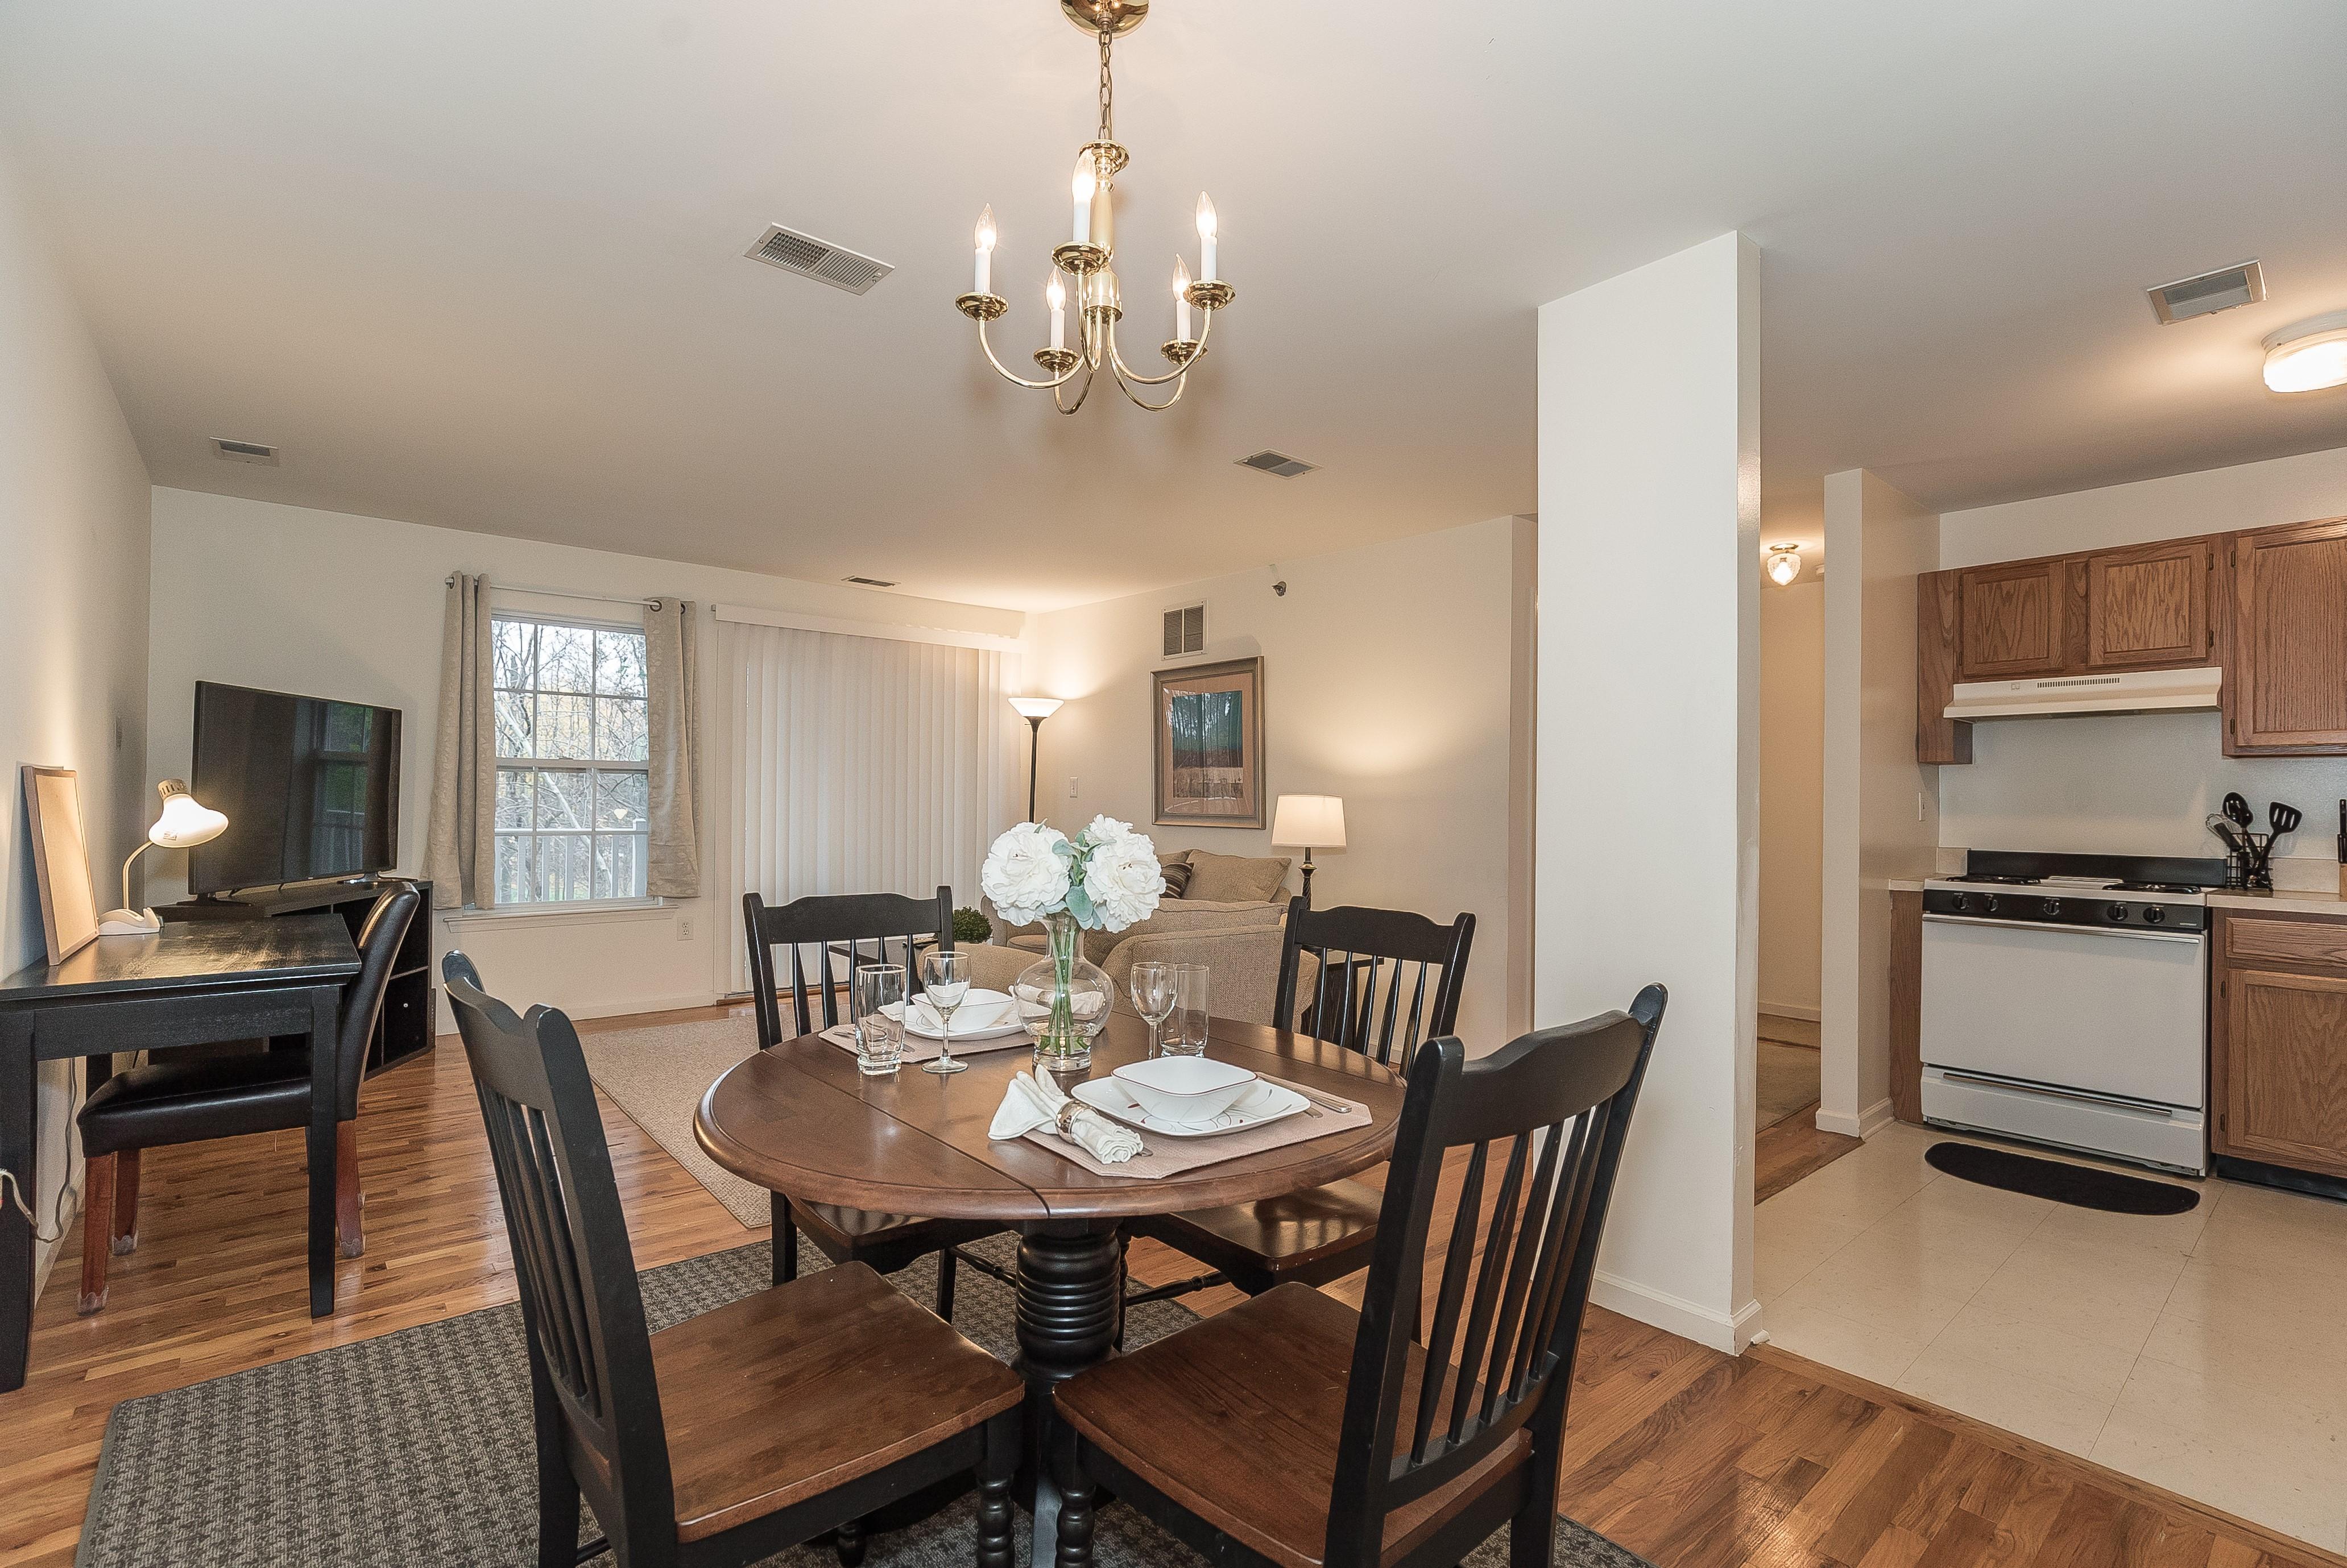 4-Short_Term_Housing_South_Plainfield_724_Dining Area